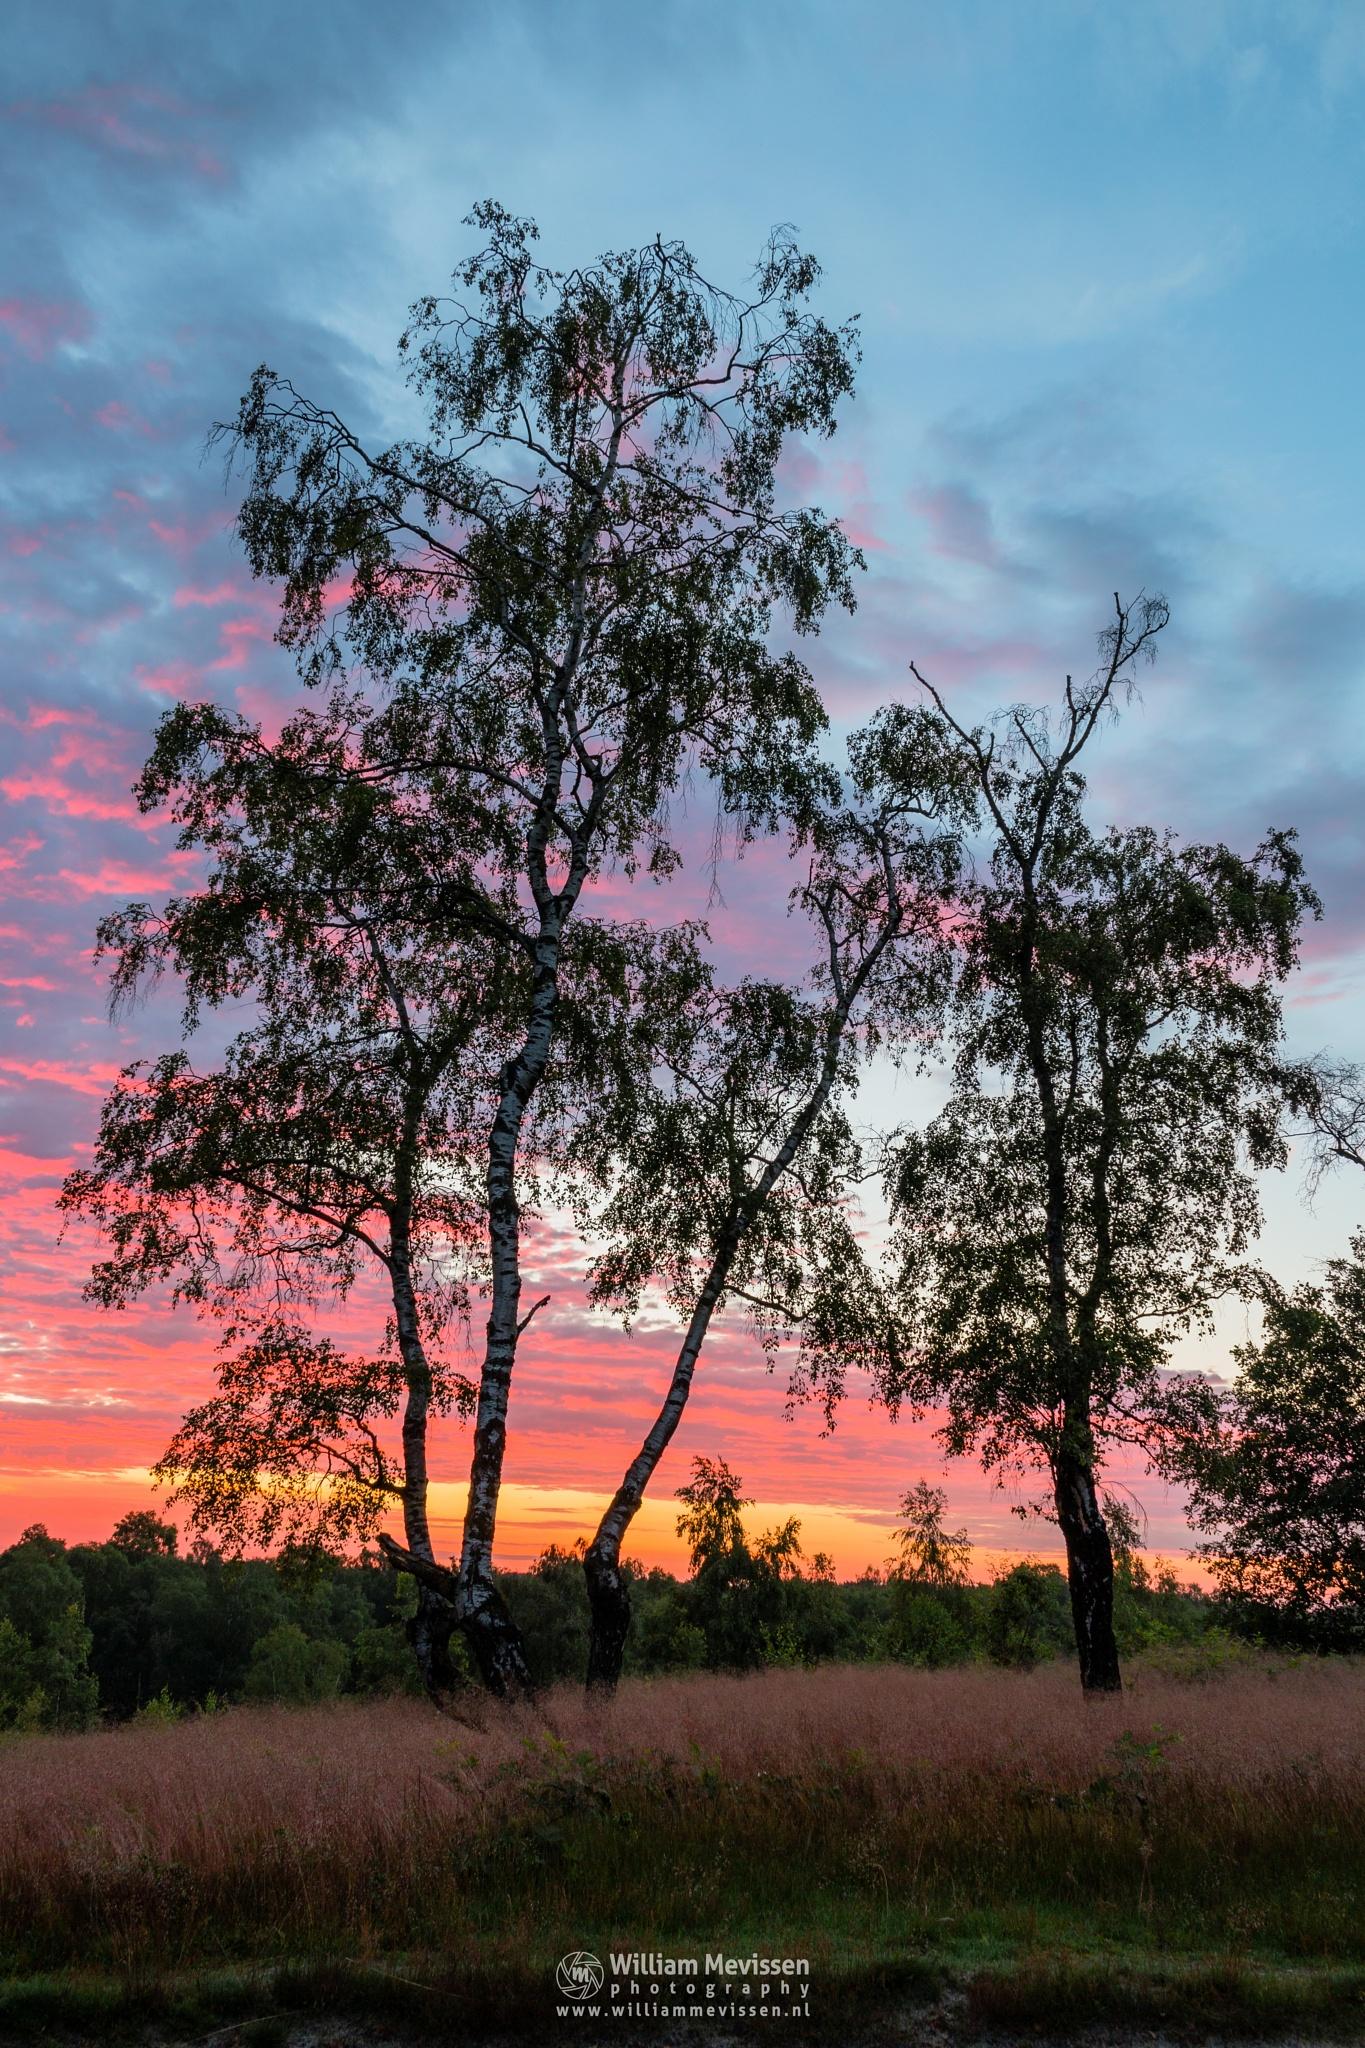 Colorful Twilight Birches by William Mevissen